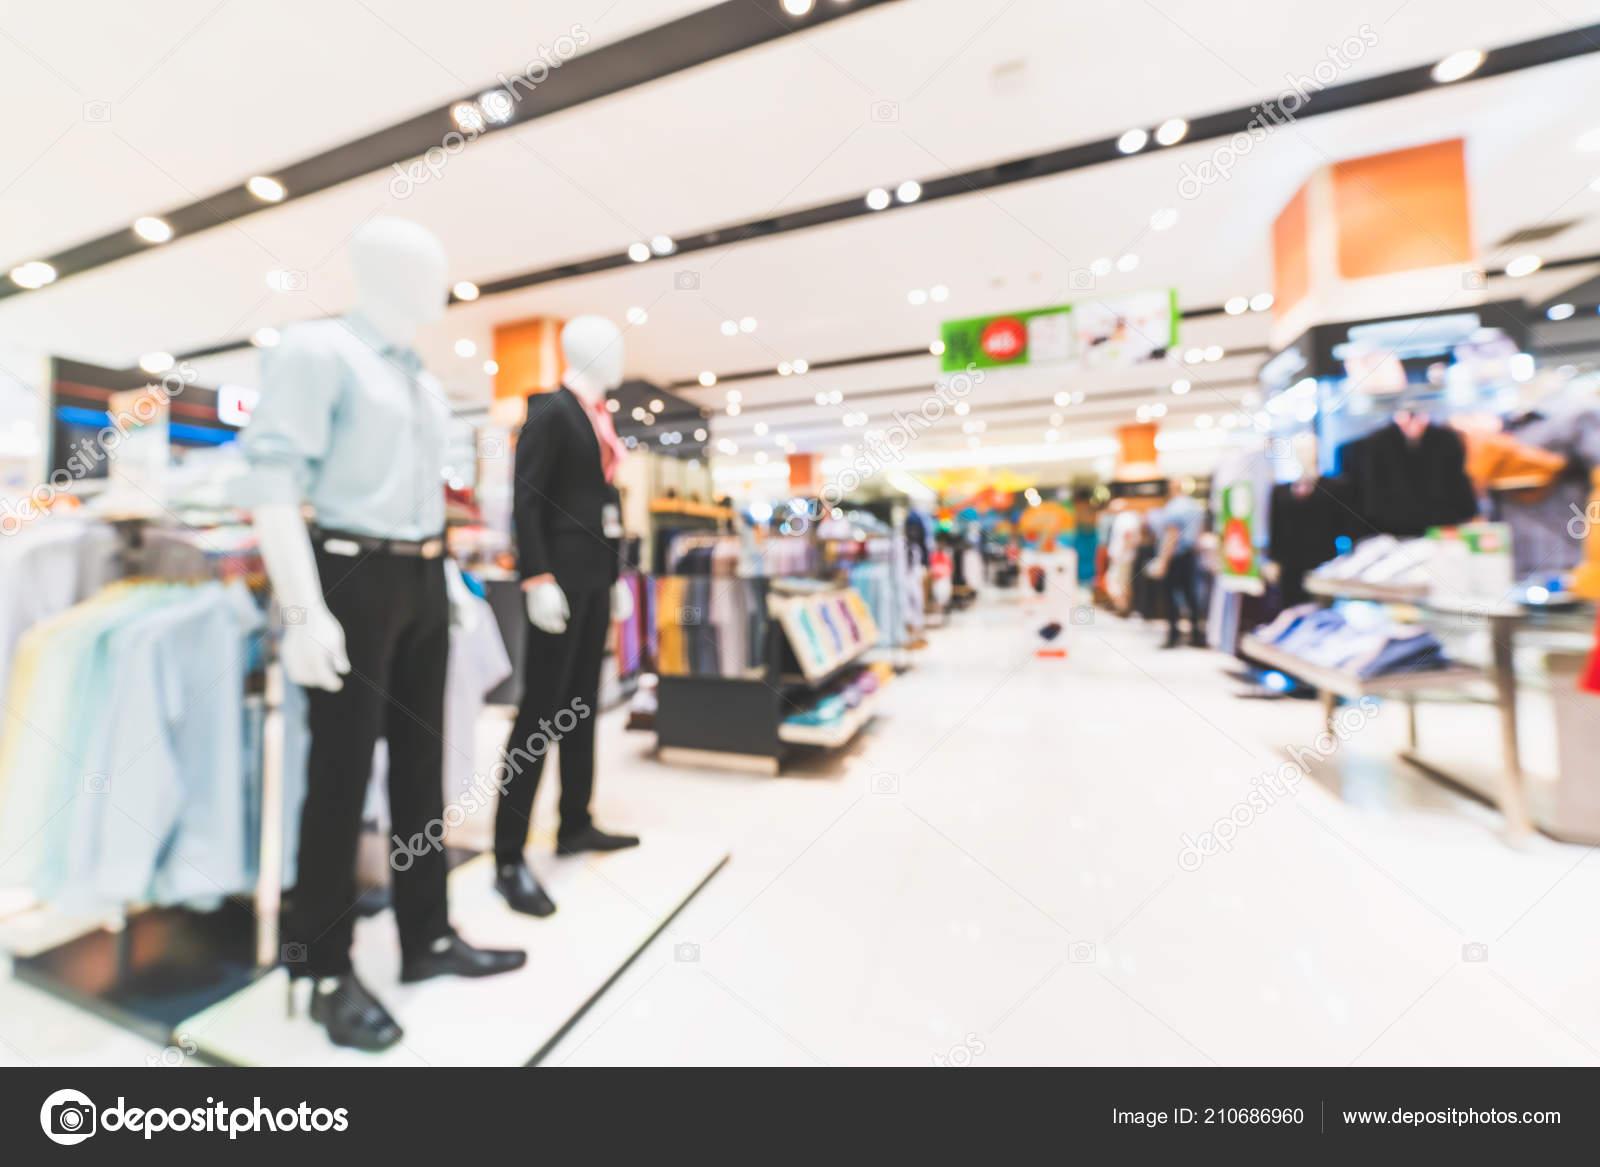 f2cd15acec2 Θολή Φόντο Defocused Ανδρικά Ρούχα Καταστήματα Στο Σύγχρονο Εμπορικό ...